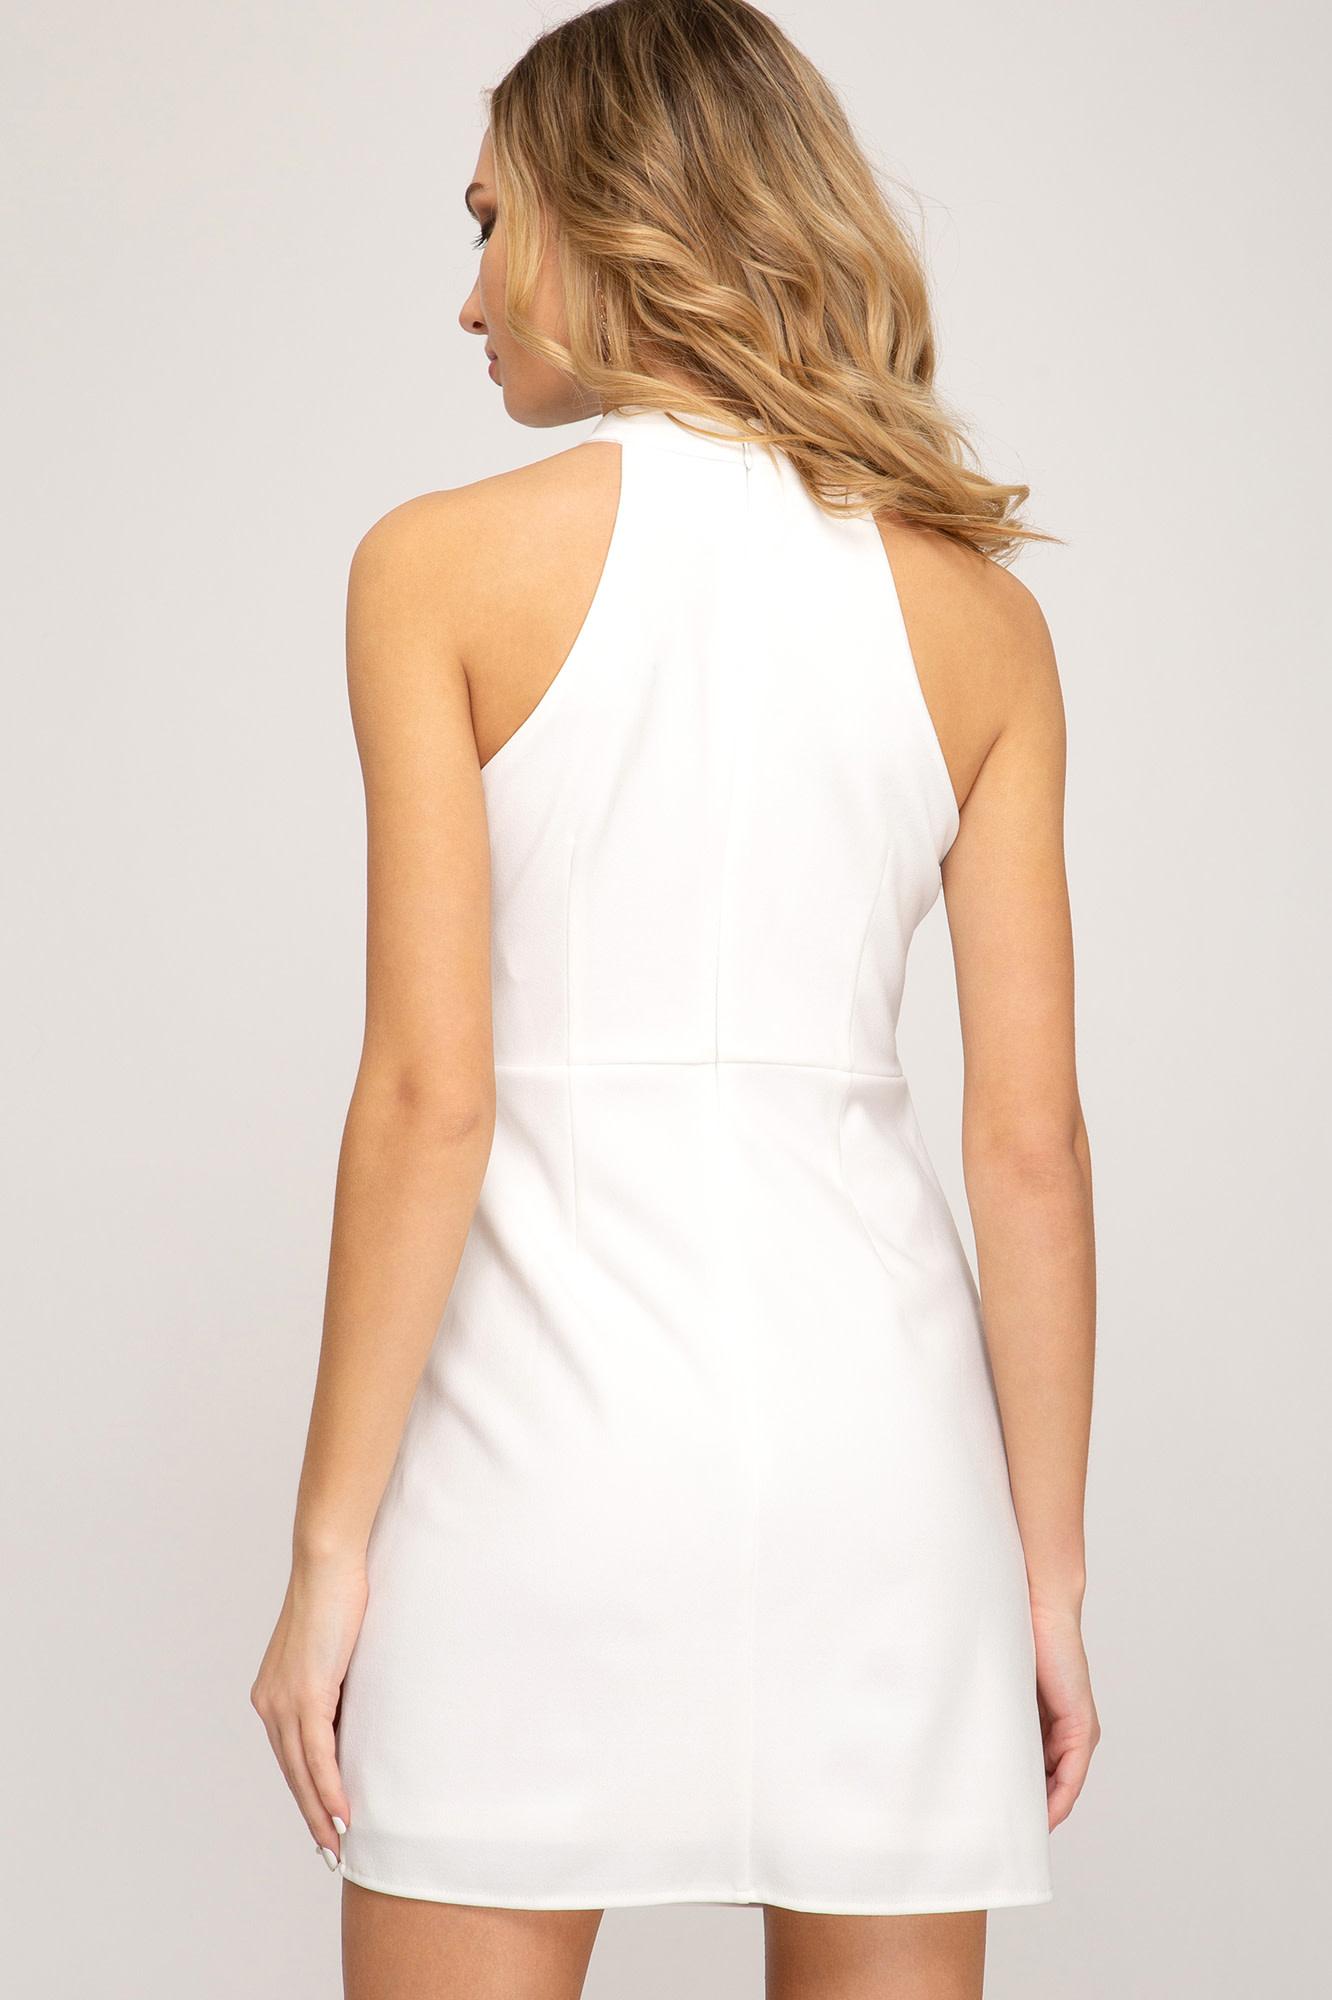 White halter fitted dress